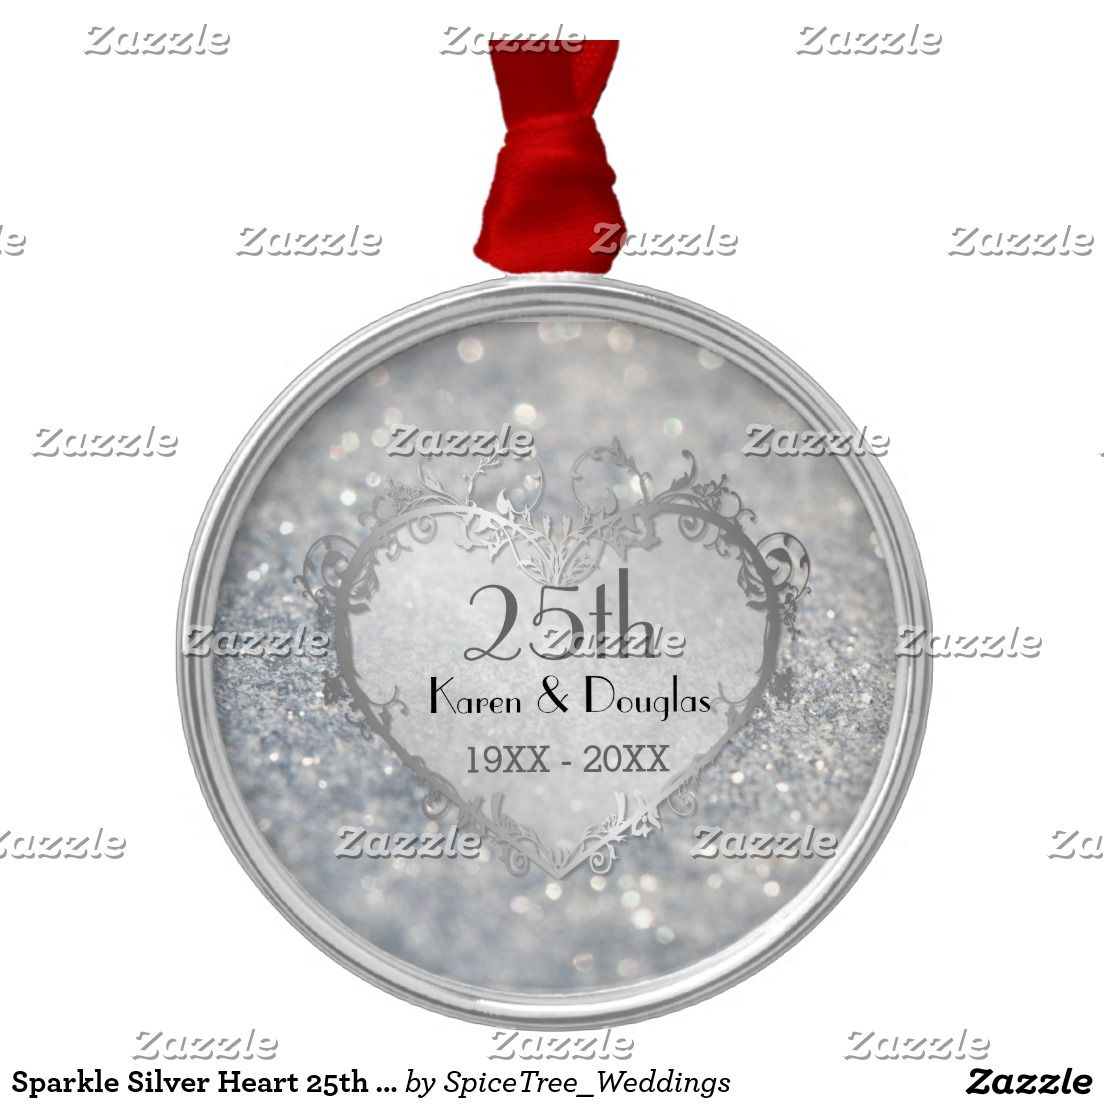 25th wedding anniversary christmas ornament - Sparkle Silver Heart 25th Wedding Anniversary Metal Ornament